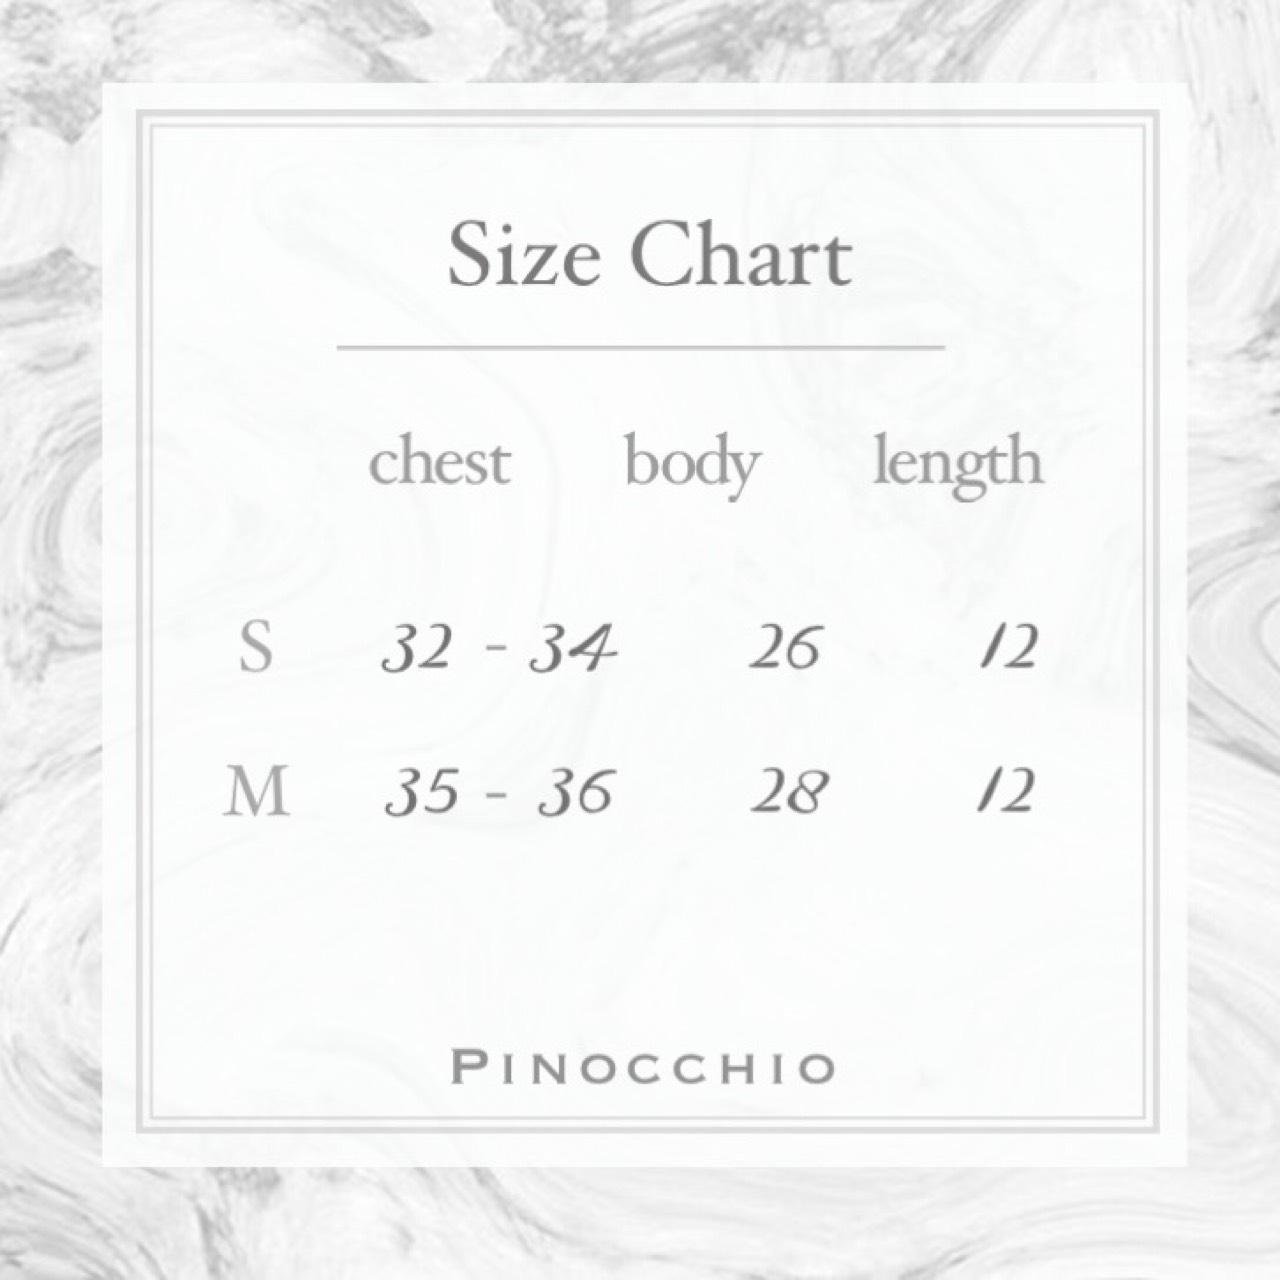 PINOCCHIO,crop,top,bra,ผู้หญิง,Women,เสื้อผู้หญิง,เสื้อครอป,เสื้อครอปสายเดี่ยว,เสื้อครอปสีพื้น,เสื้อครอปสีดำ,สีดำ